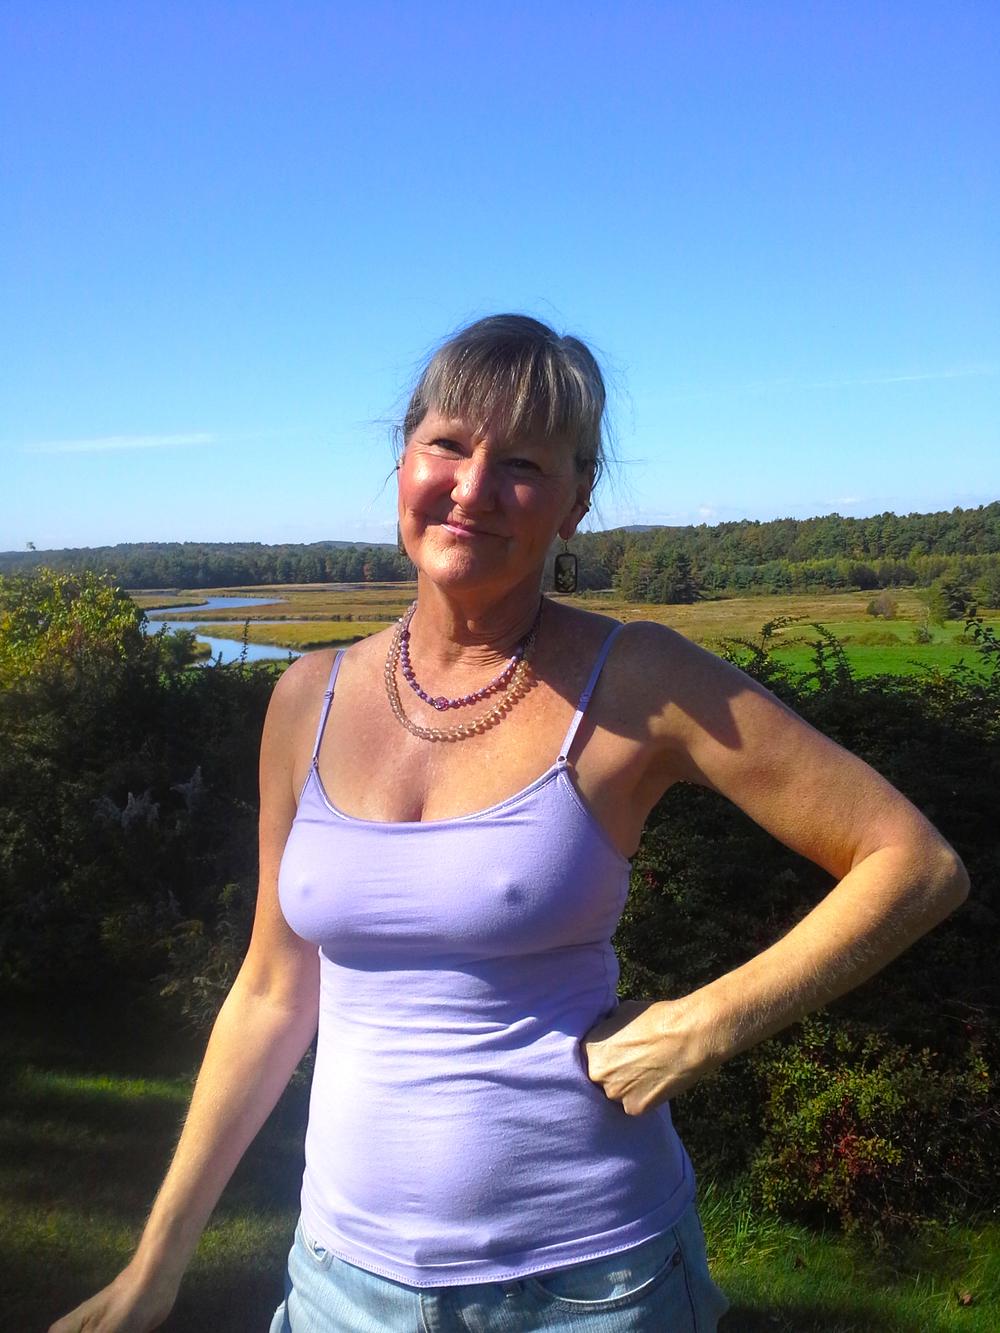 Aimees-profile-pic.jpg